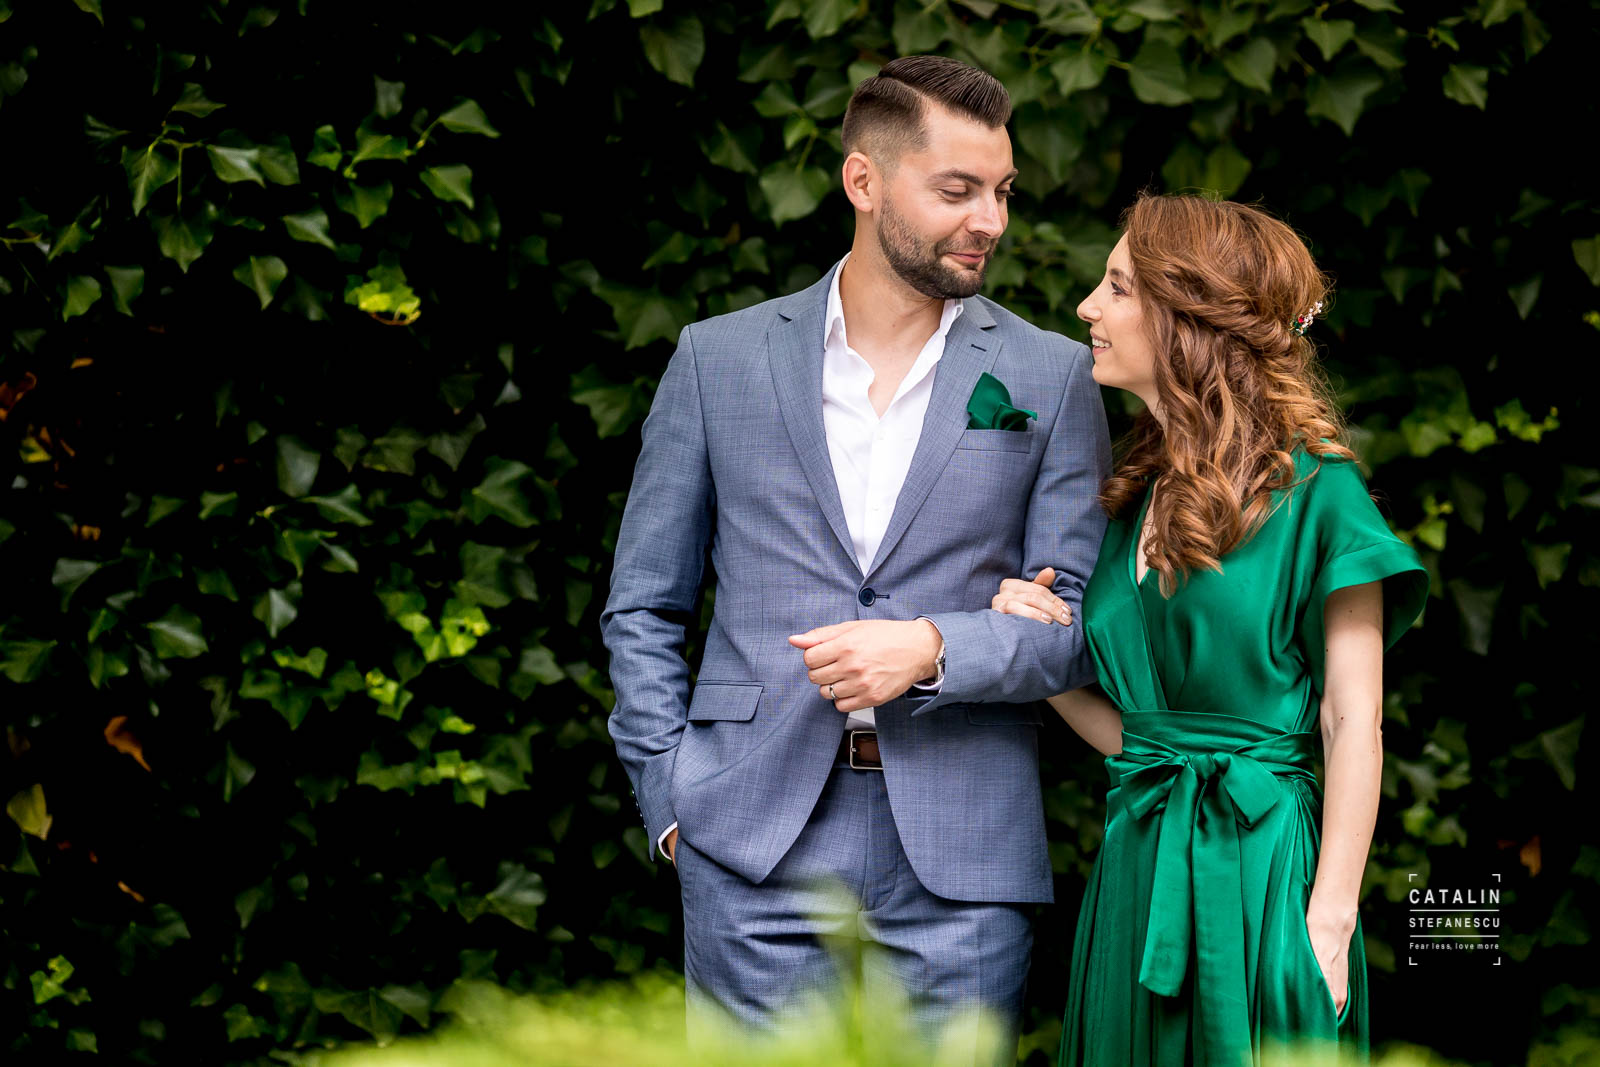 Fotografi Nunta - Fotograf Profesionist Bucuresti - Catalin Stefanescu - Nunta Ana maria & Adrian